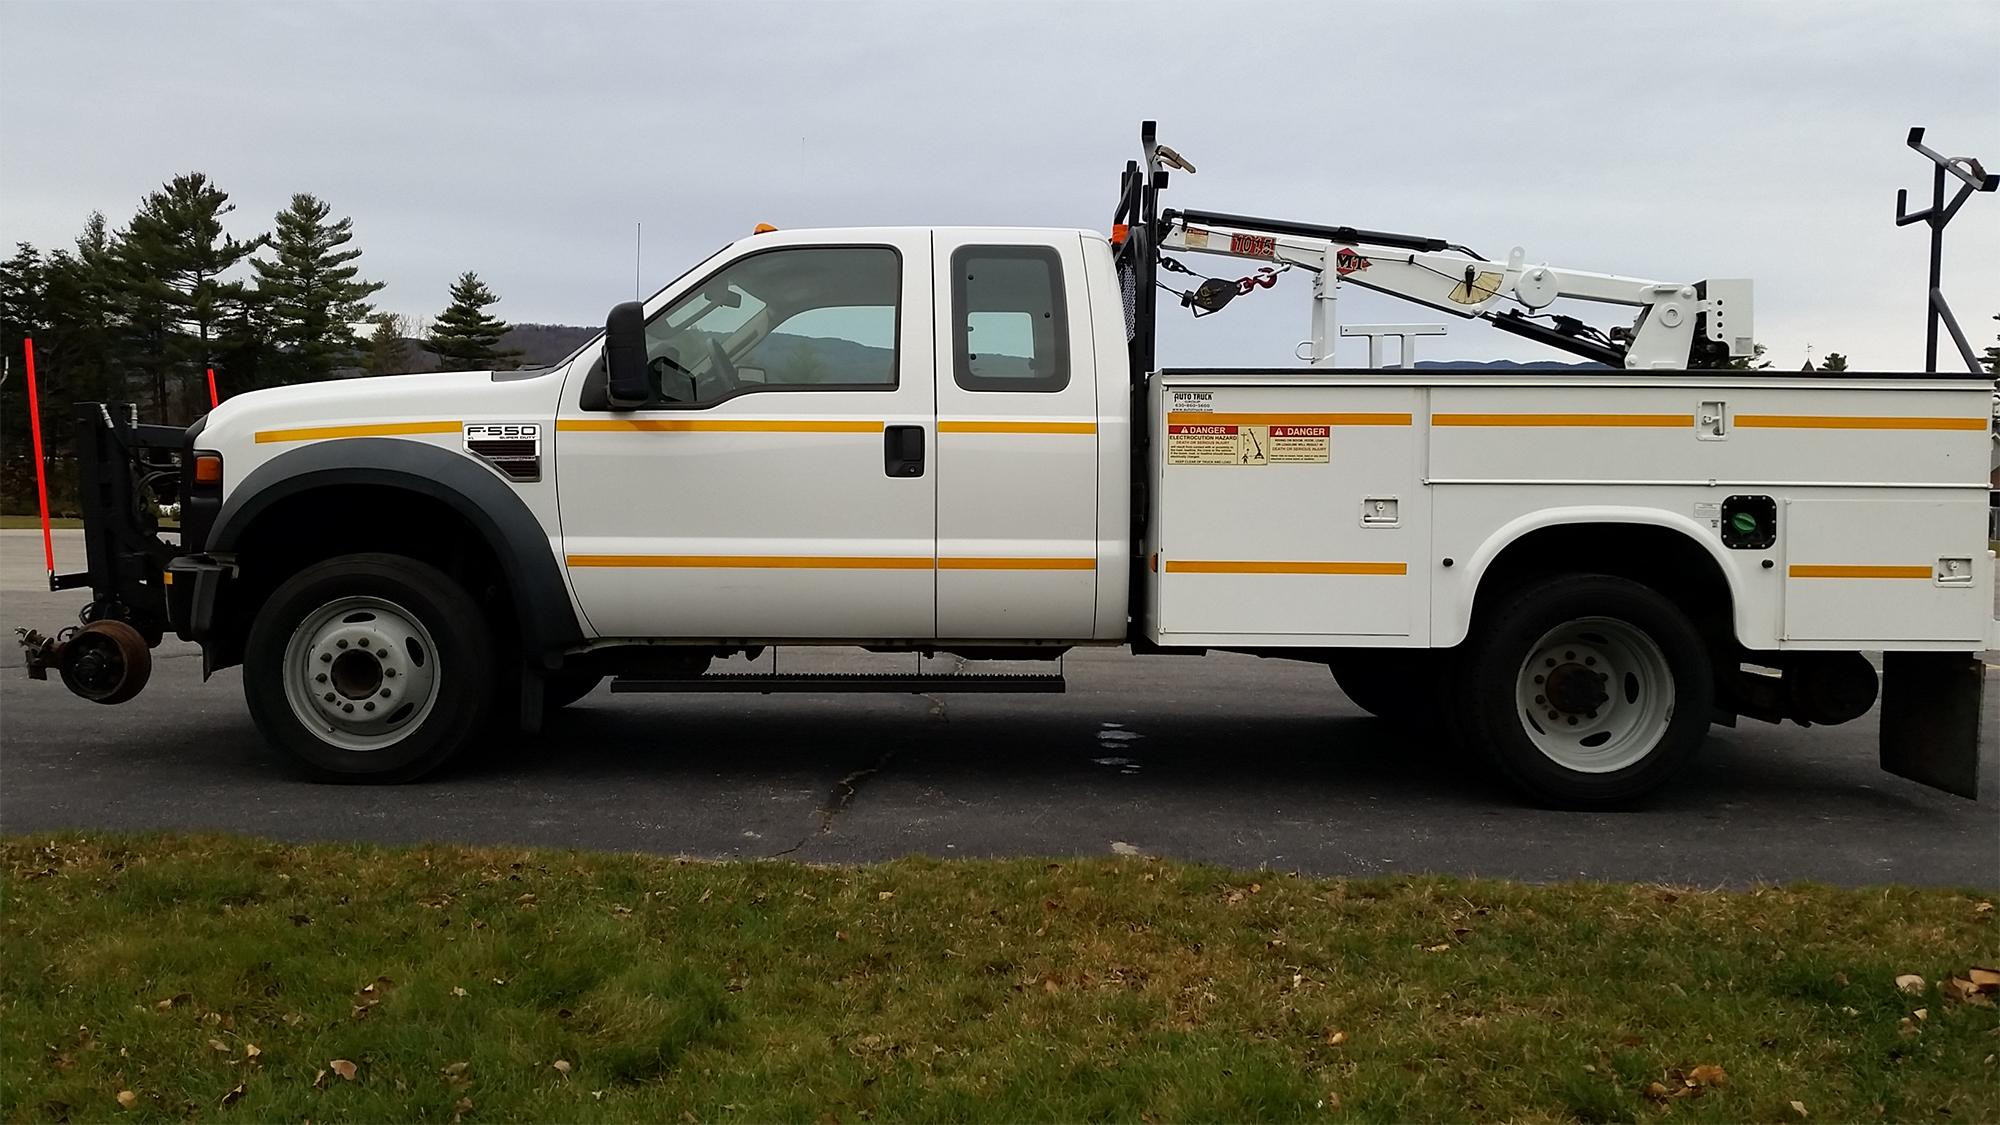 Truck with Hyrail attachment